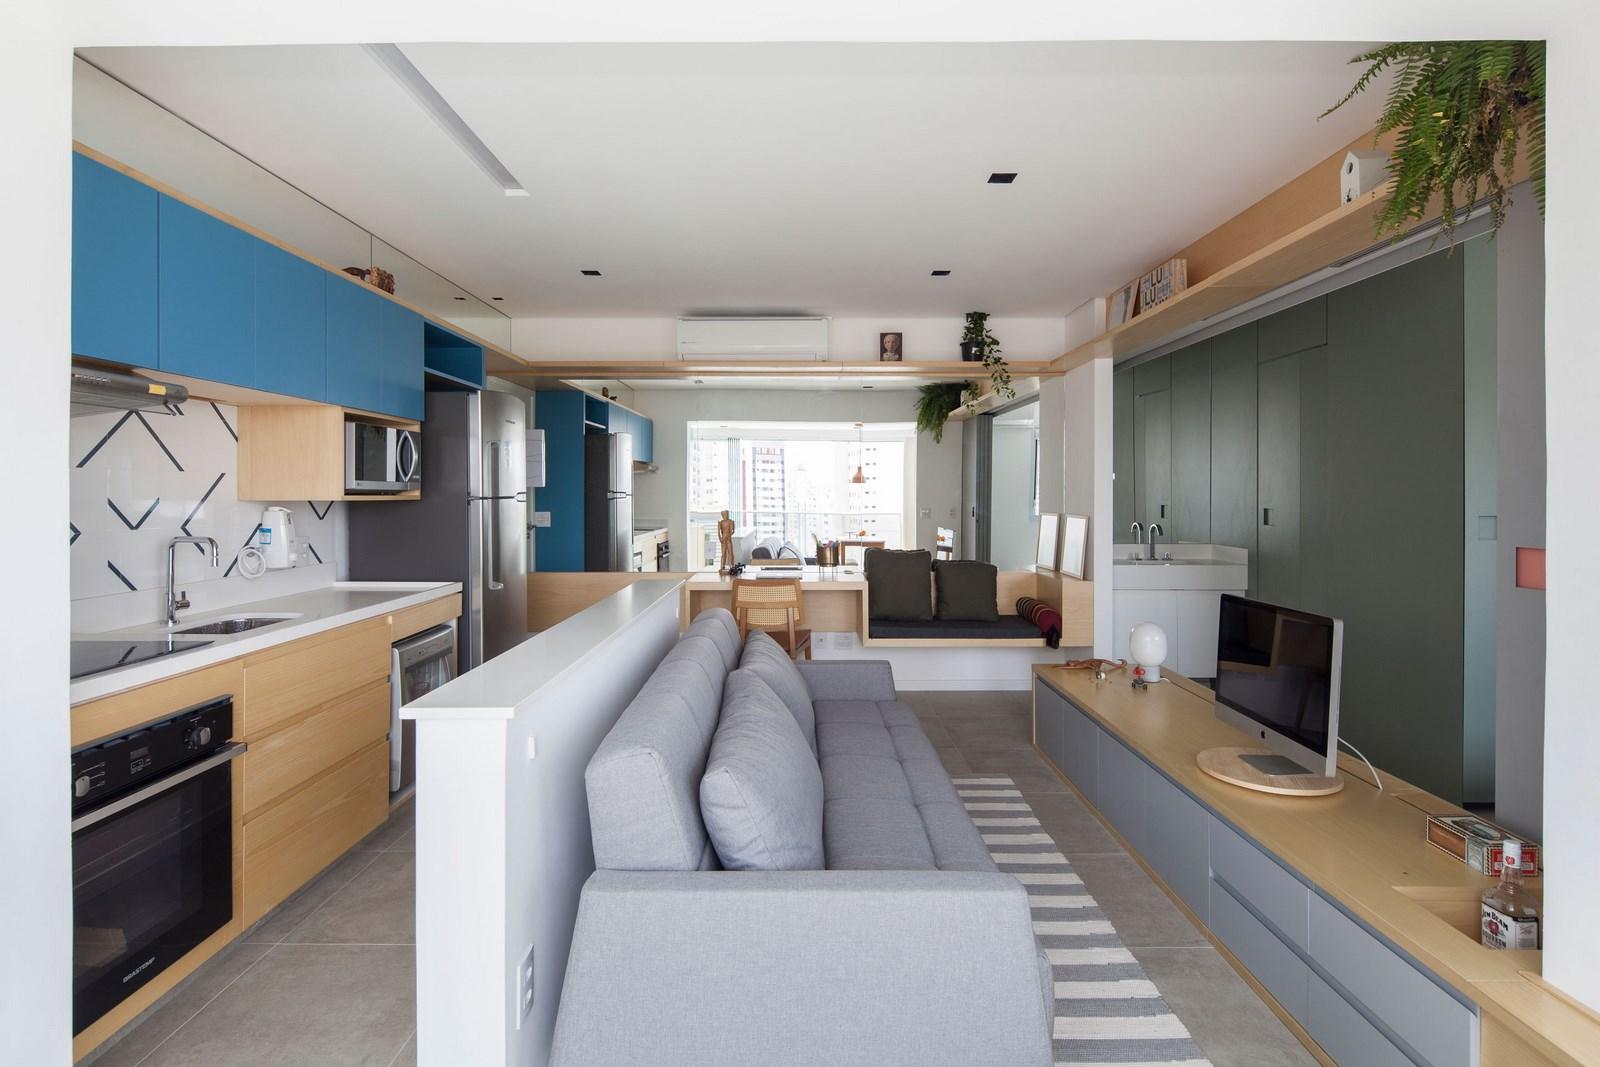 Apartamento Cazo _ Estúdio BRA (5) (Copy)